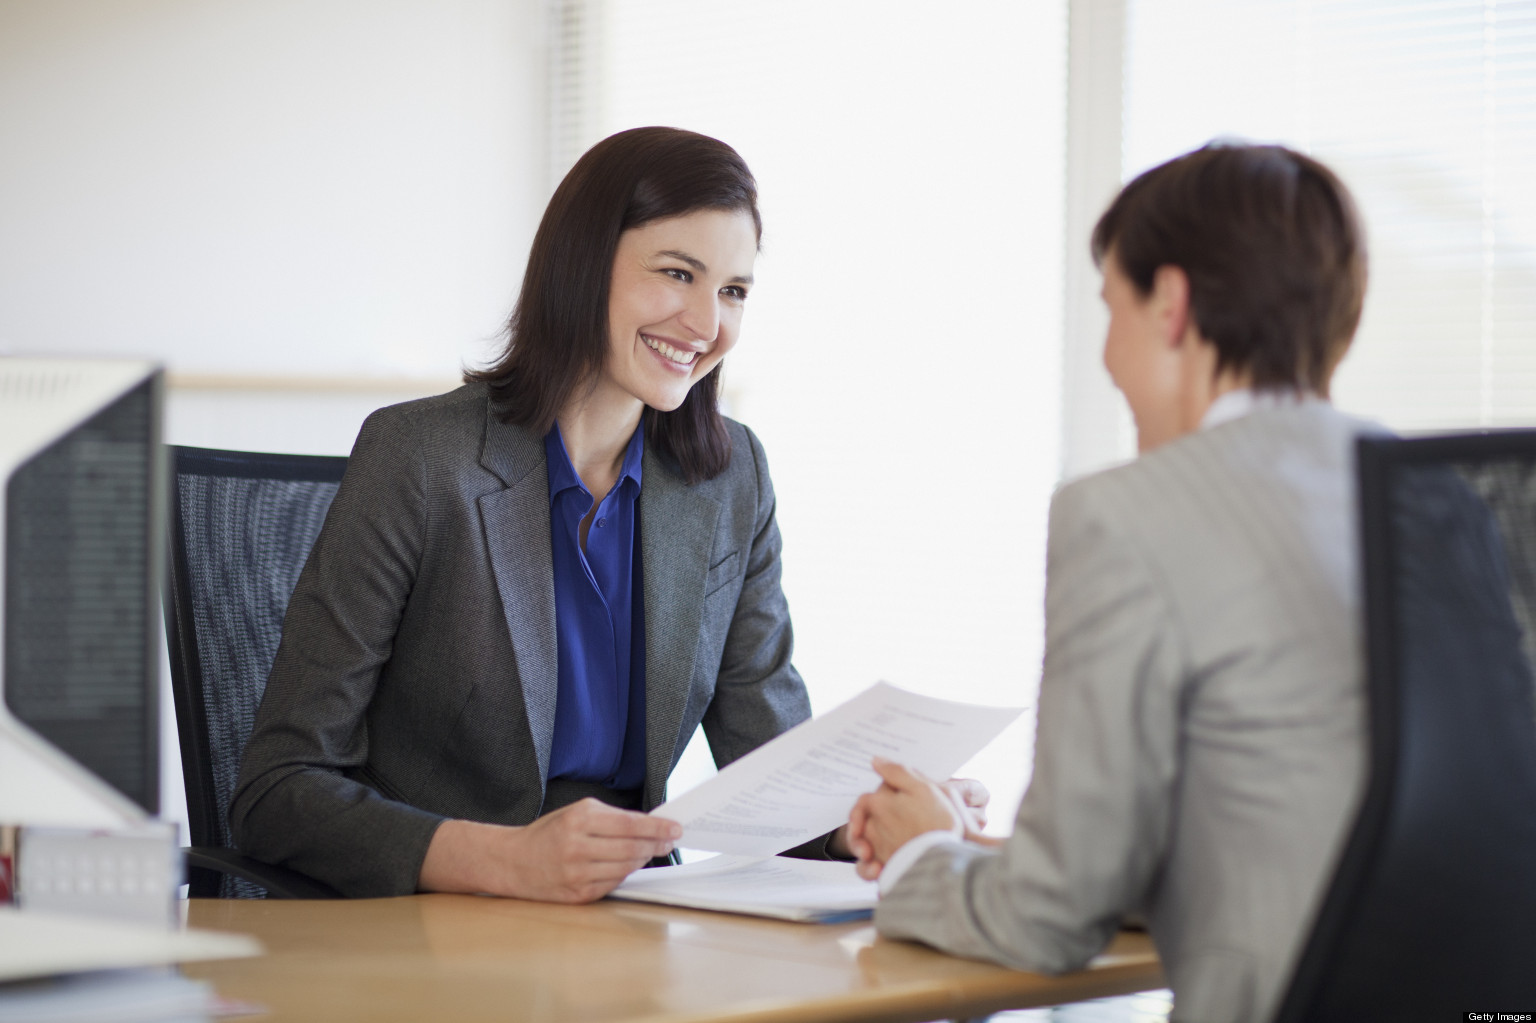 news how to follow up after an interview